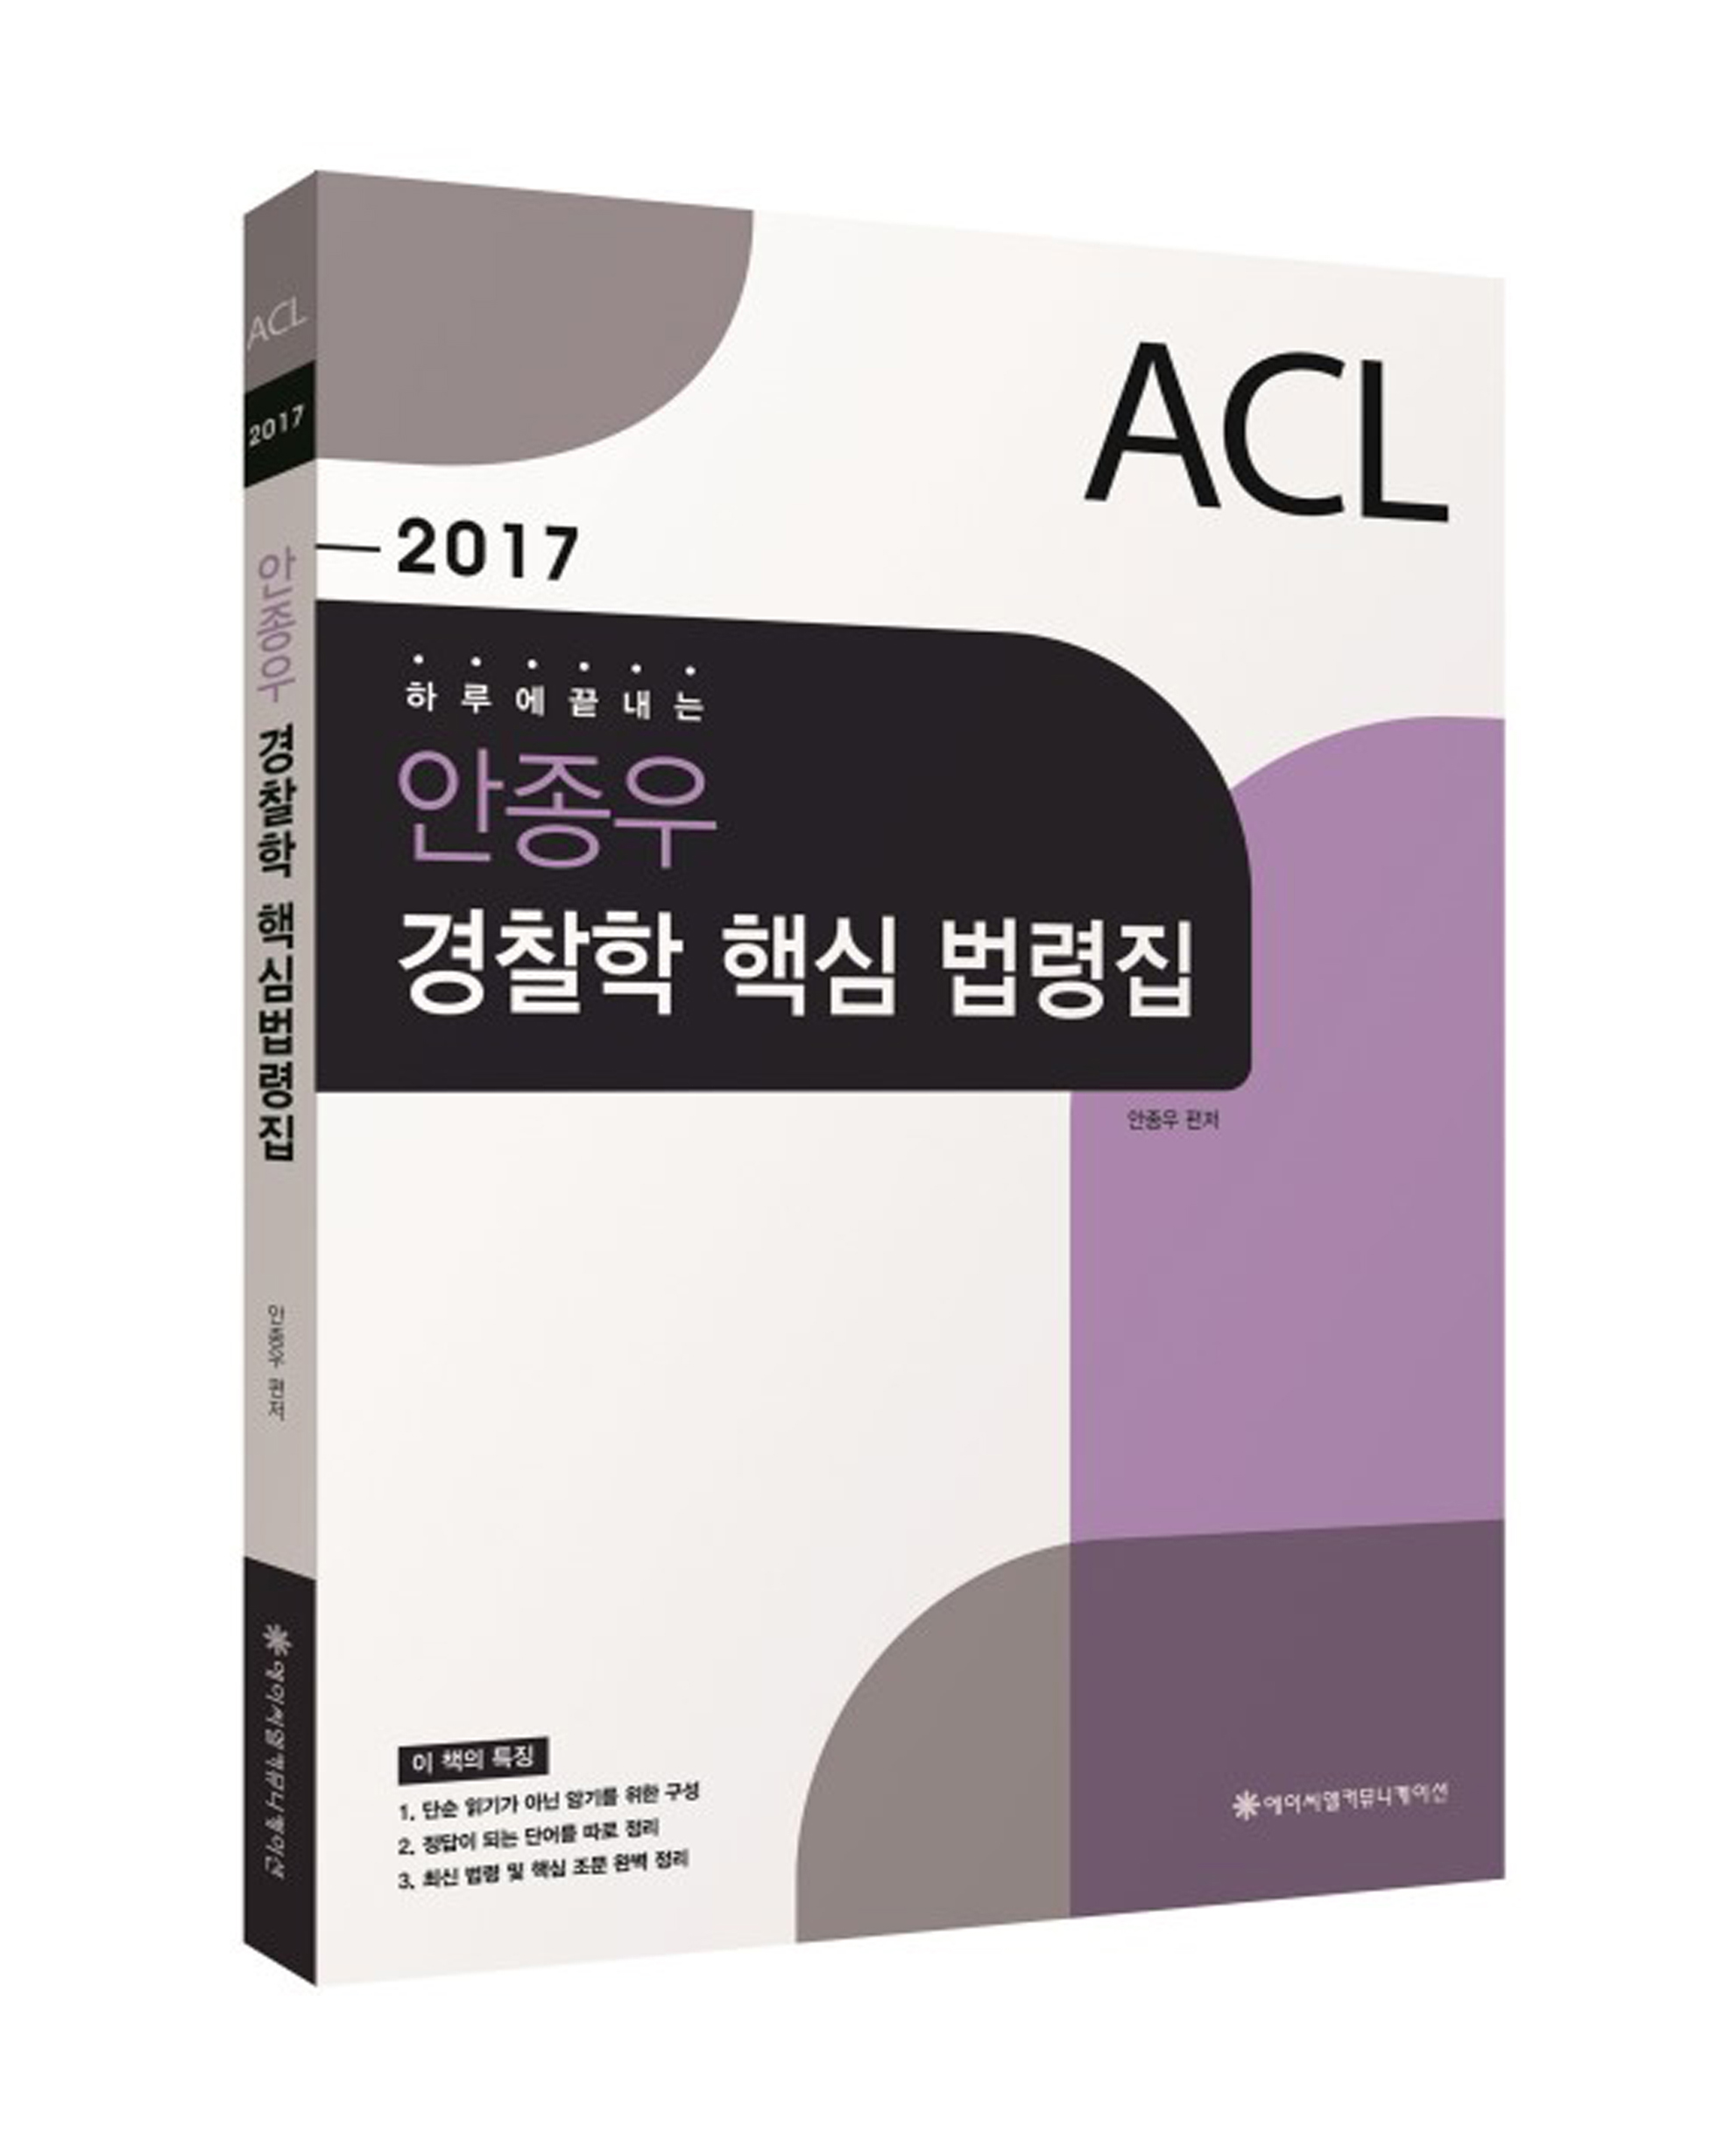 2017 ACL 안종우 경찰학 핵심법령집 (법령집 + 별책부록)